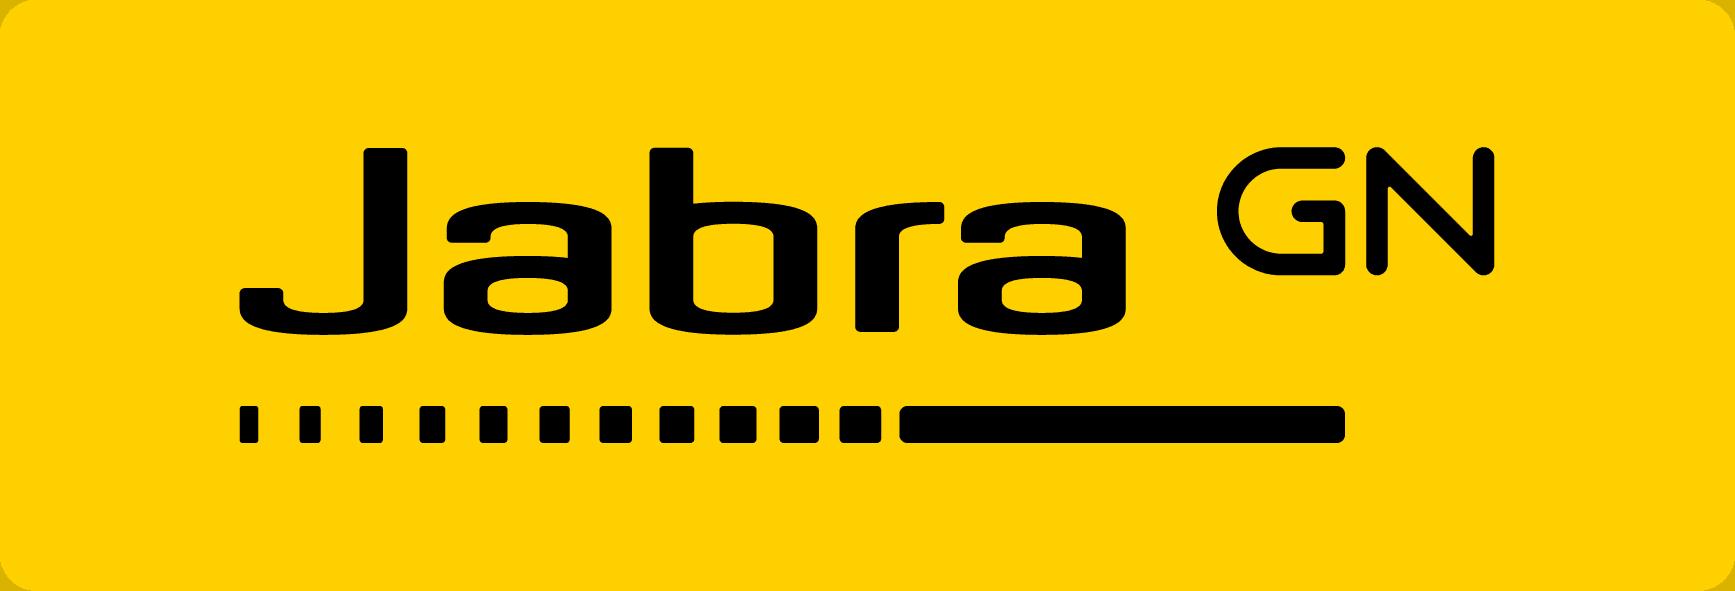 Jabra gn brandmark rgb 150ppi